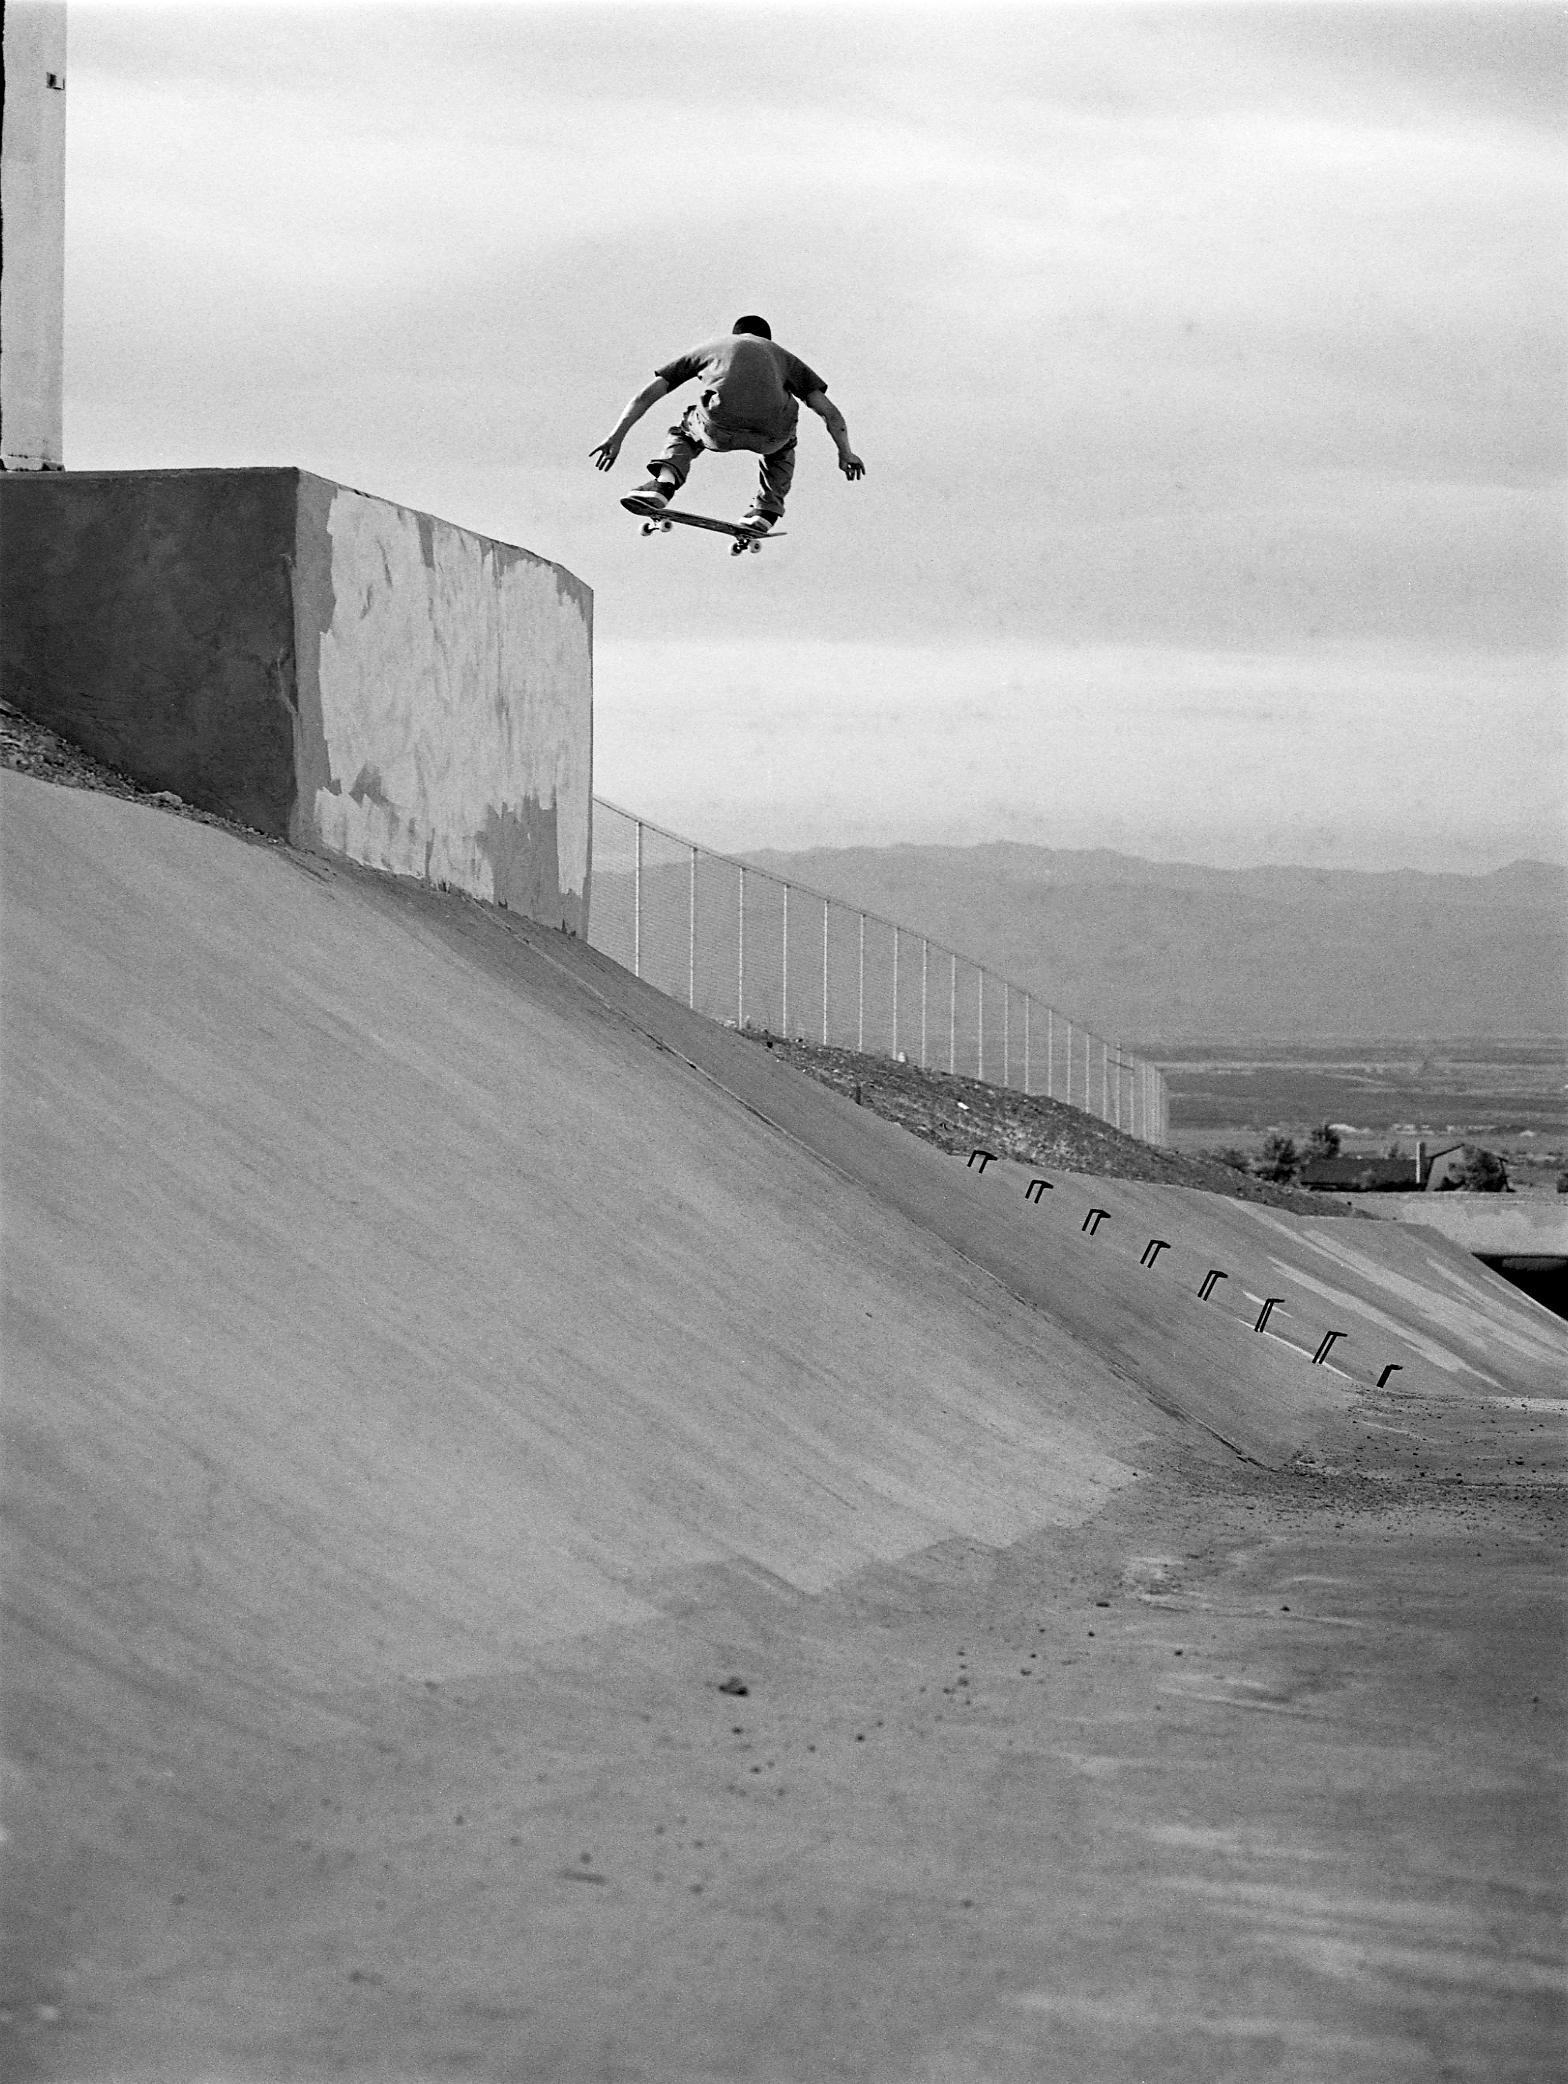 Phil Shao, Henderson, NV. 1996